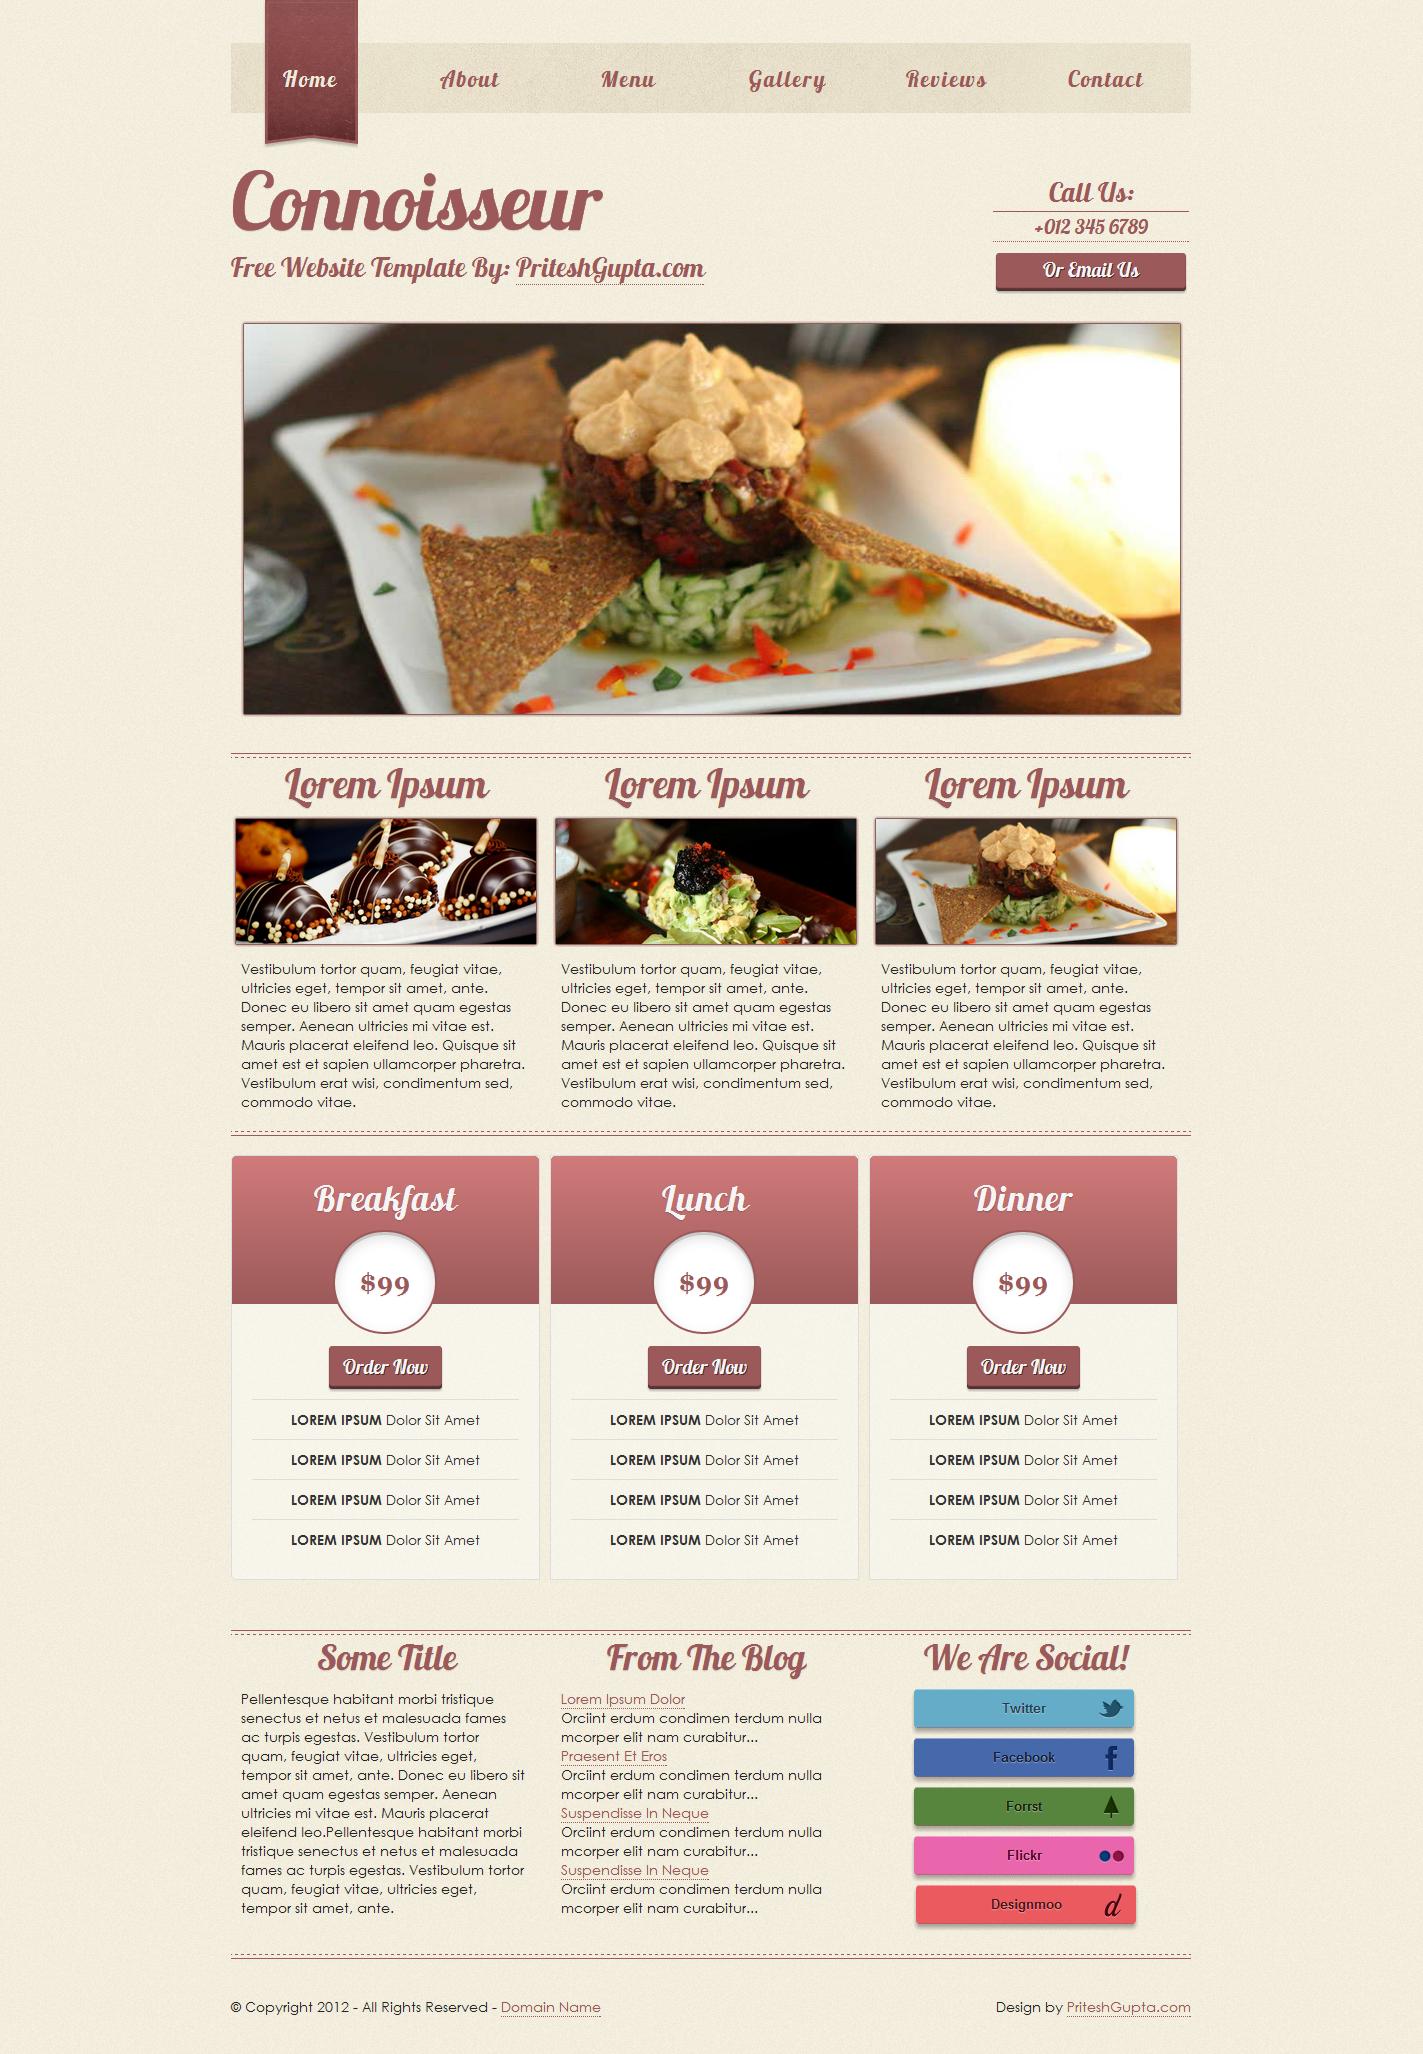 Connoisseur Free Restaurant Website Template